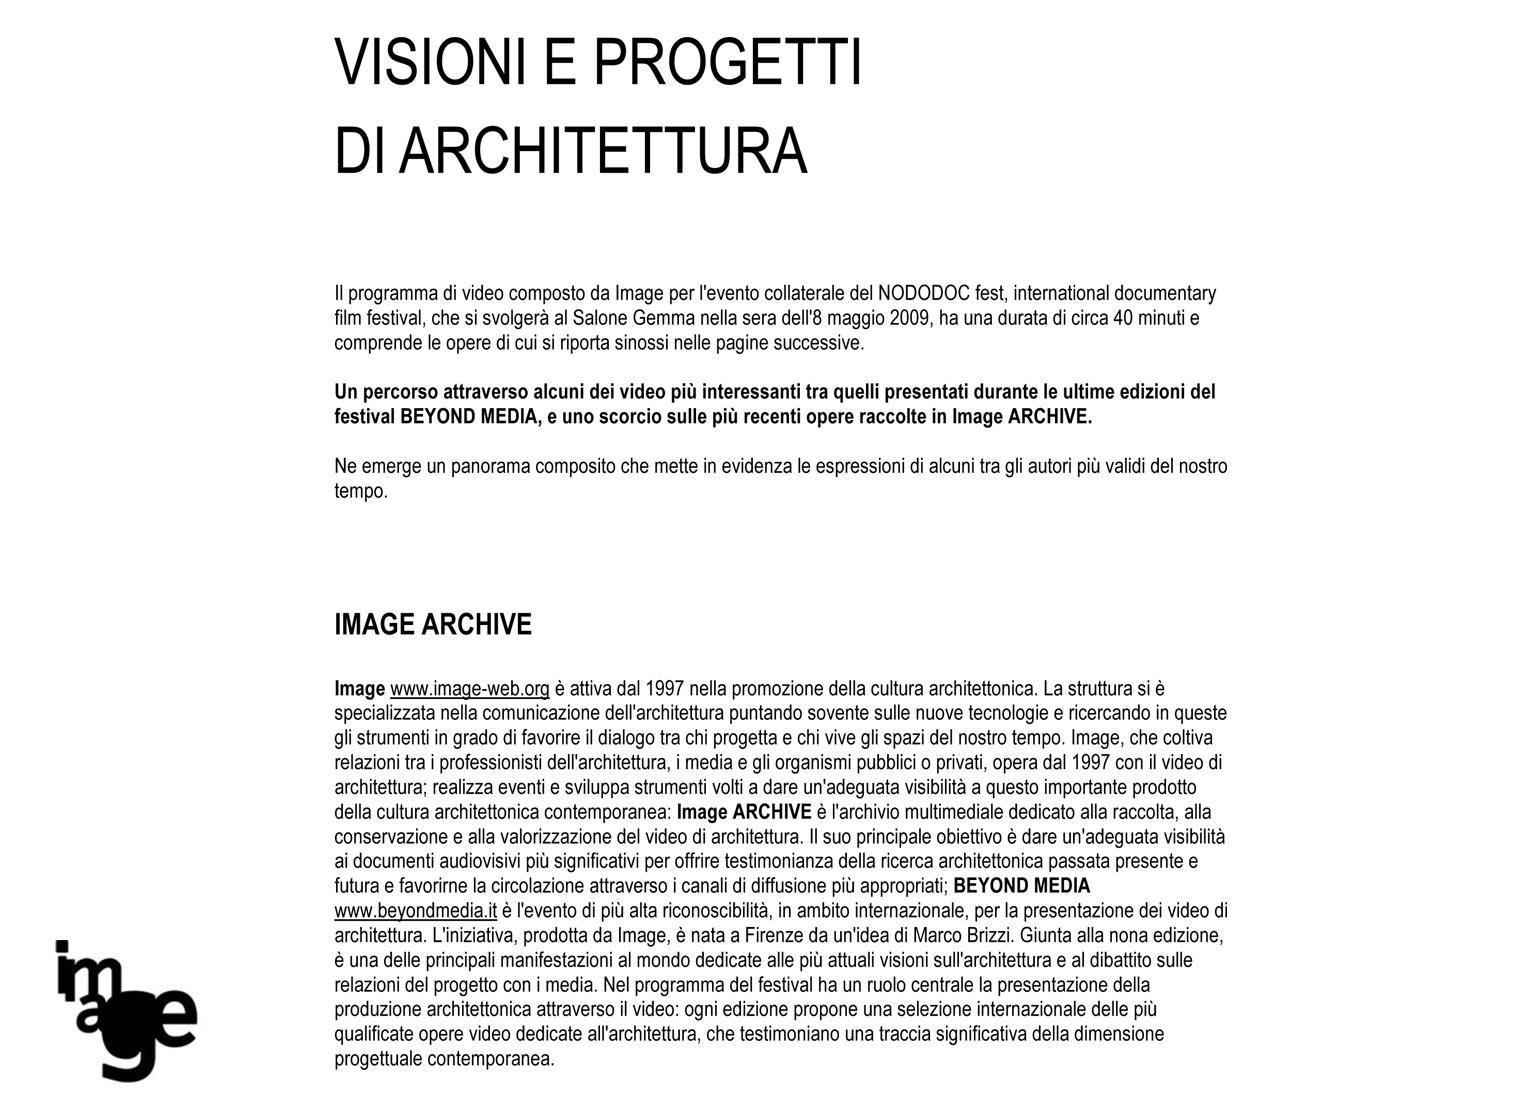 vk-architetti_archindoc_28